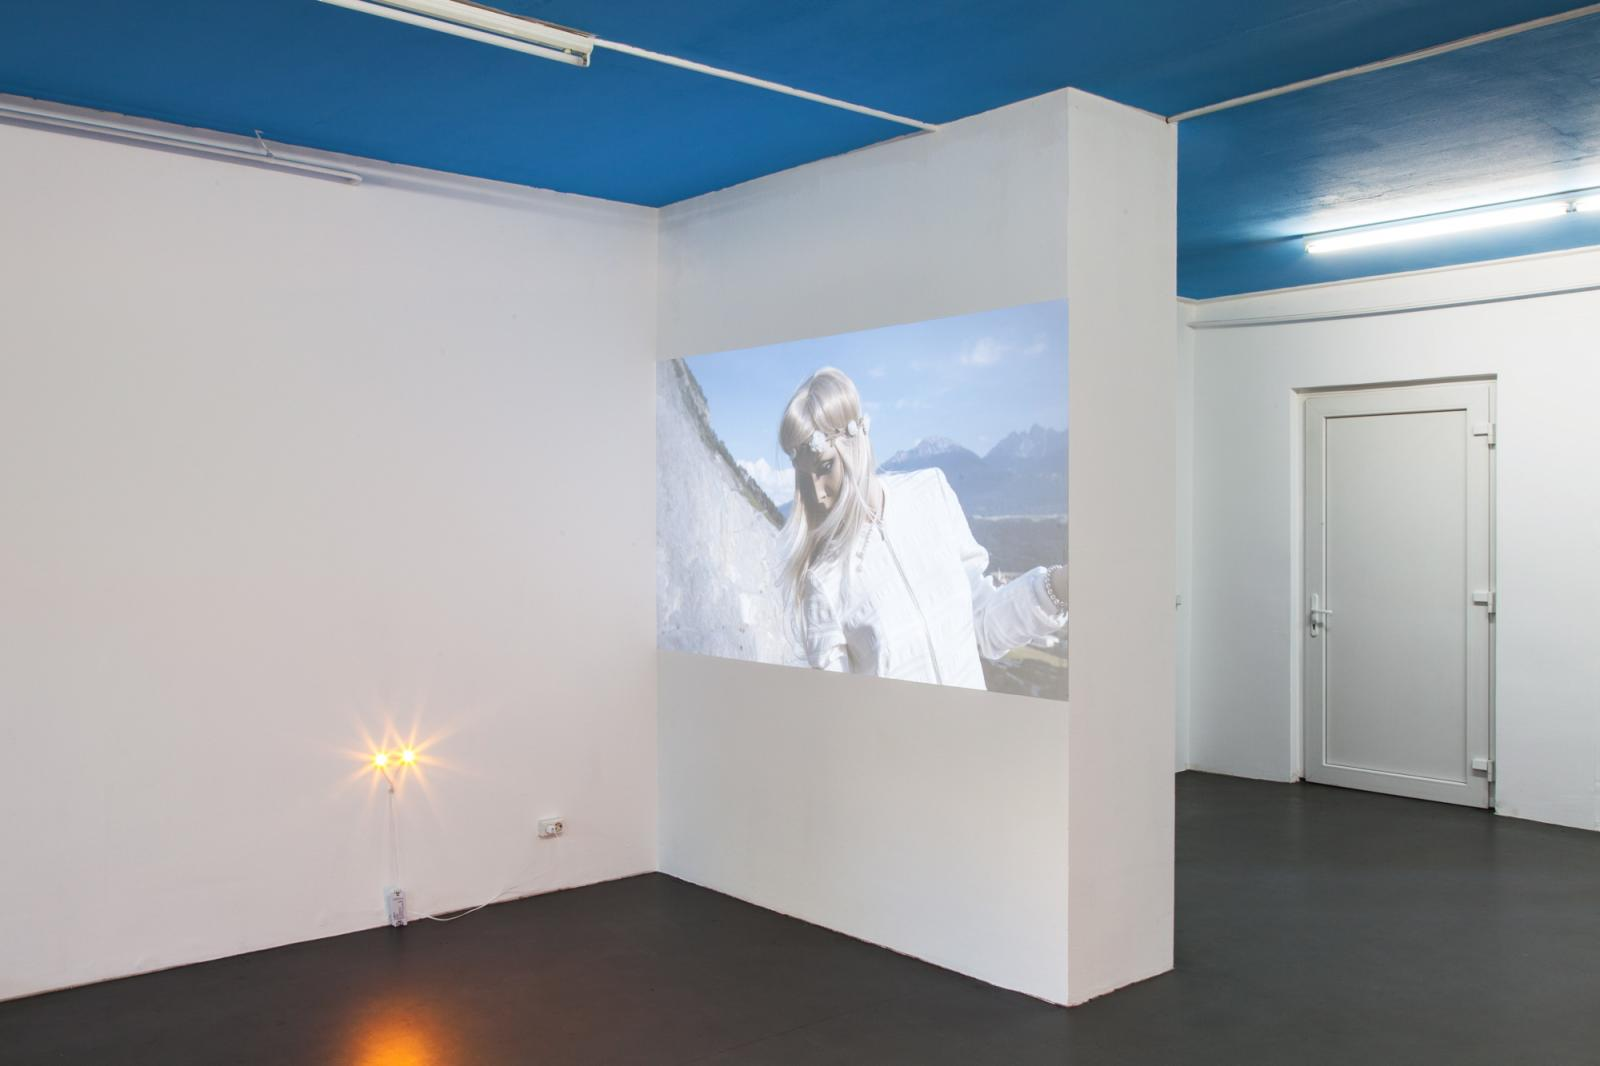 Jason Dodge,Lights the height of dogs eyes.  Richard Hoeck & John Miller Mannequin Death, 2016,High definition digital video with sound, 3 mins 14  secs